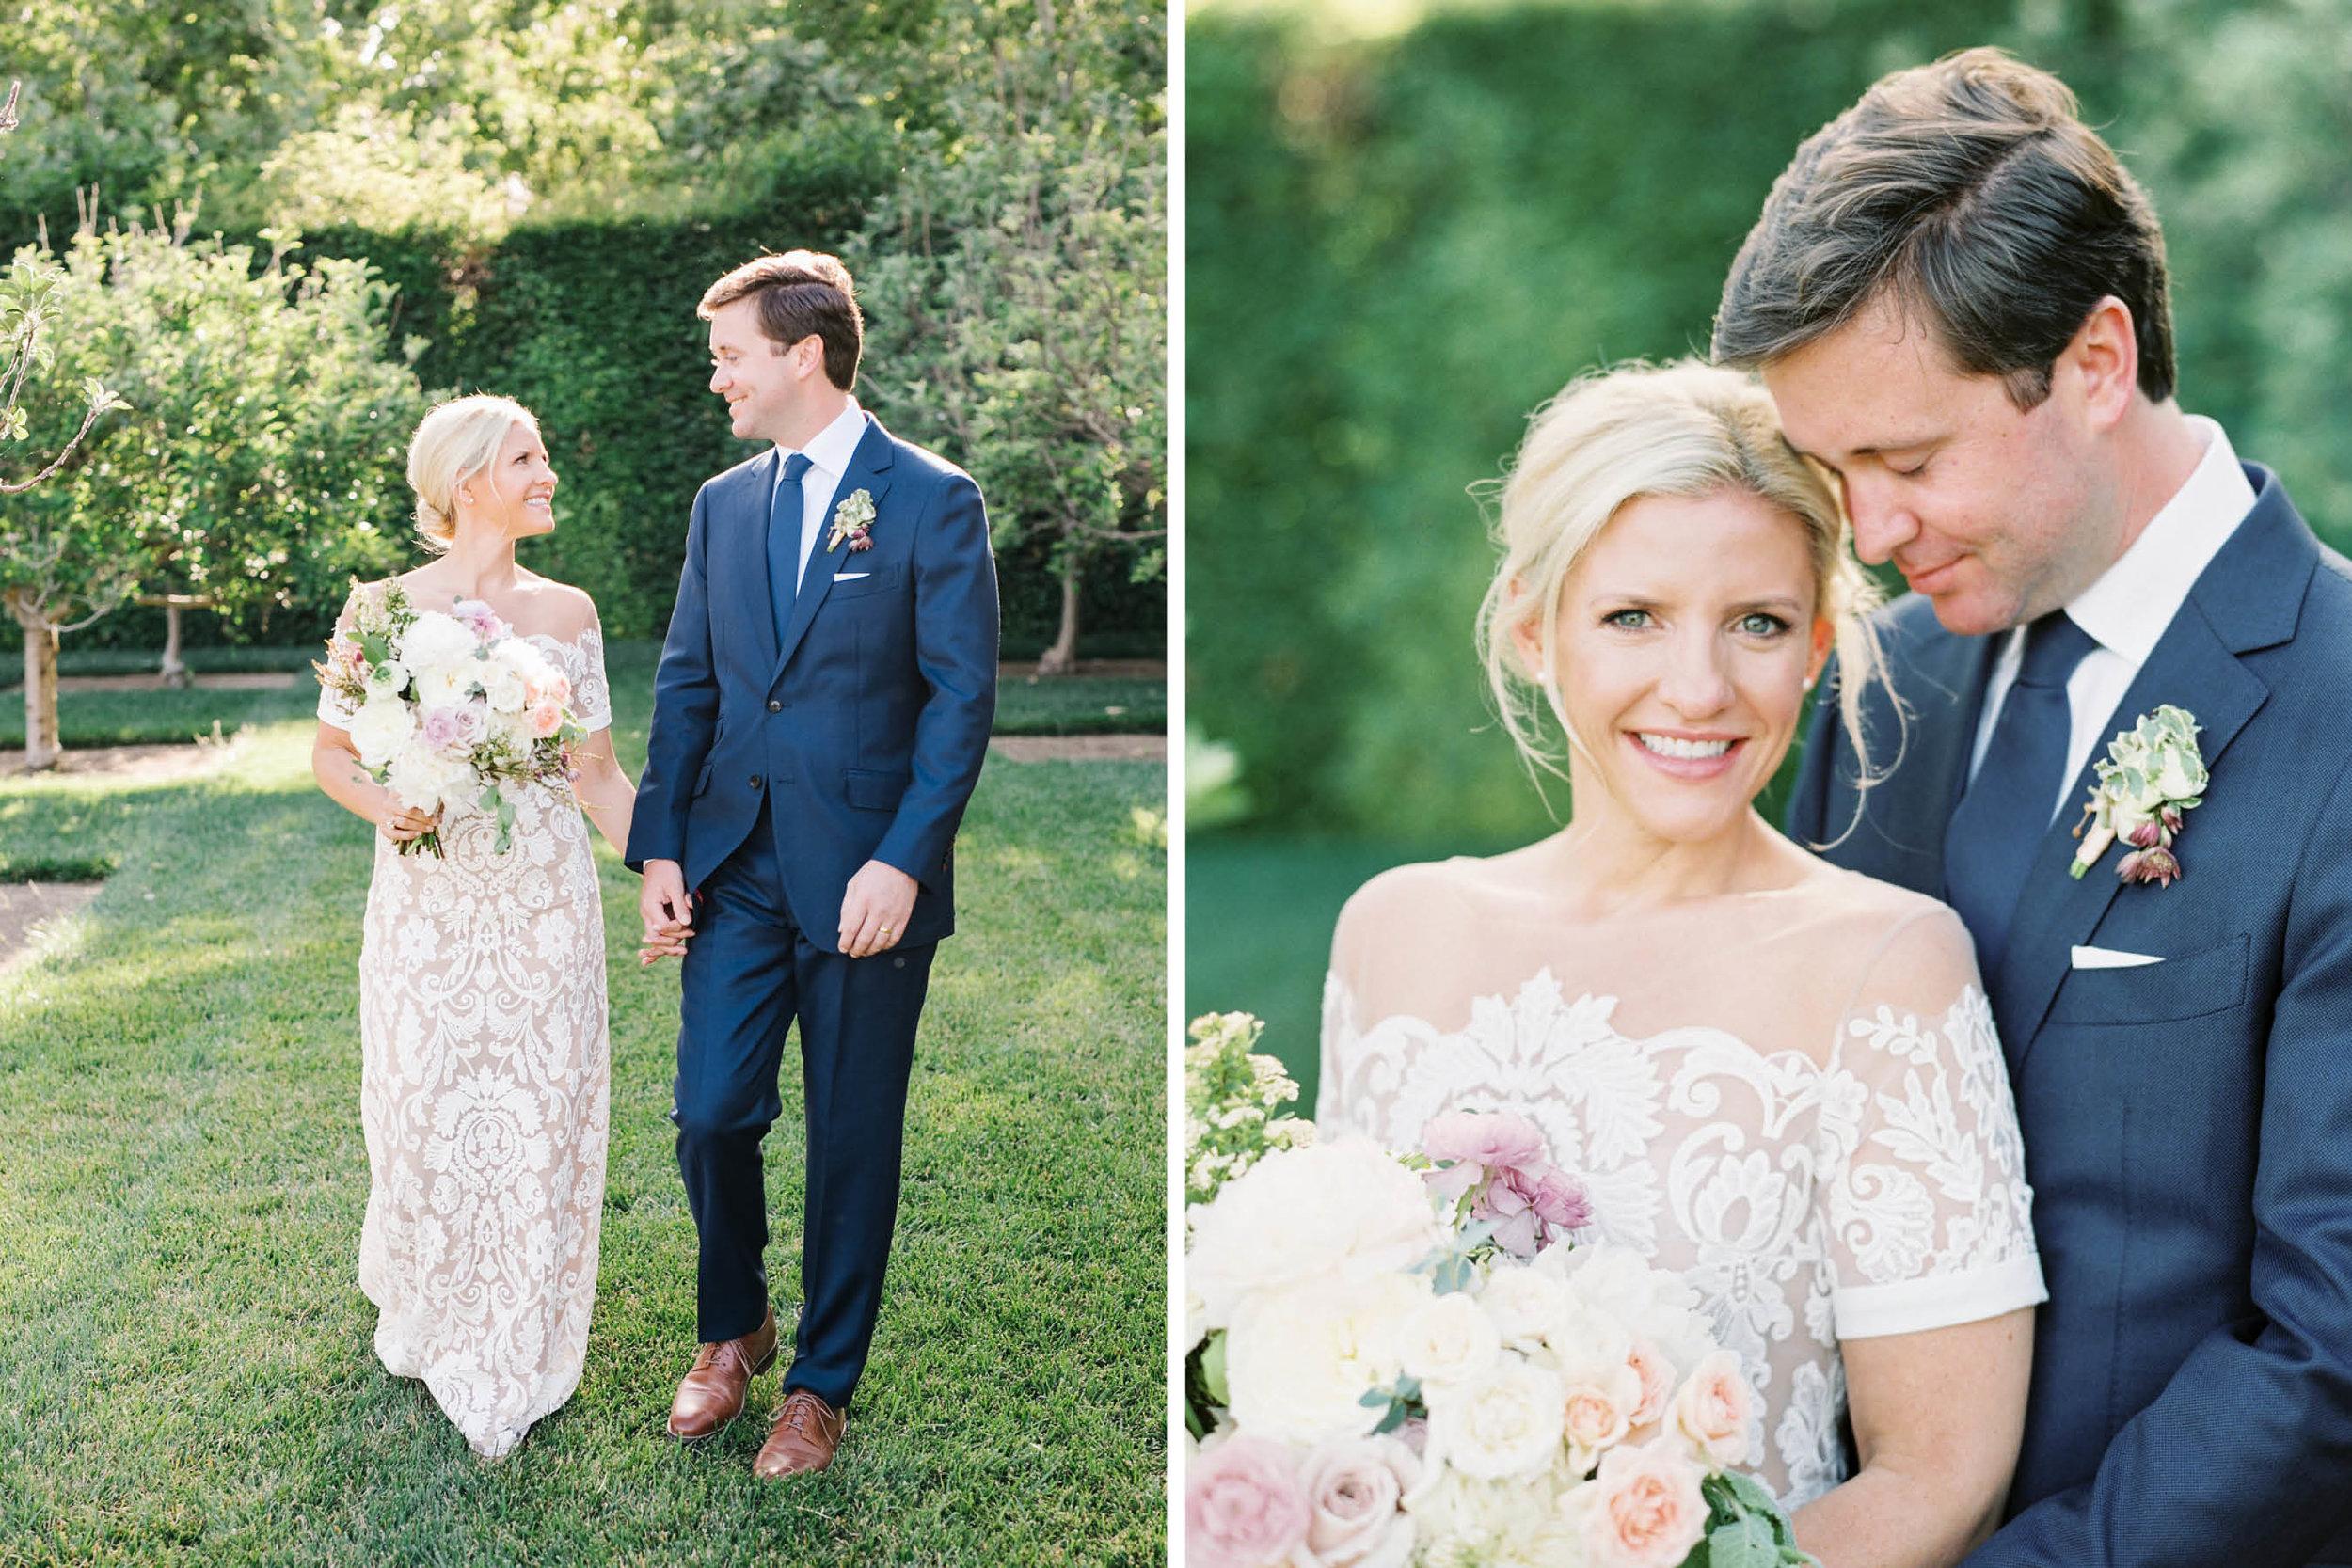 alegria-by-design-wedding-planner-planning-event-design-santa-barbara-day-of-coordinator-kestrel-park-santa-ynez-fields-castle-lavender-garden-mrs-box (29).jpg